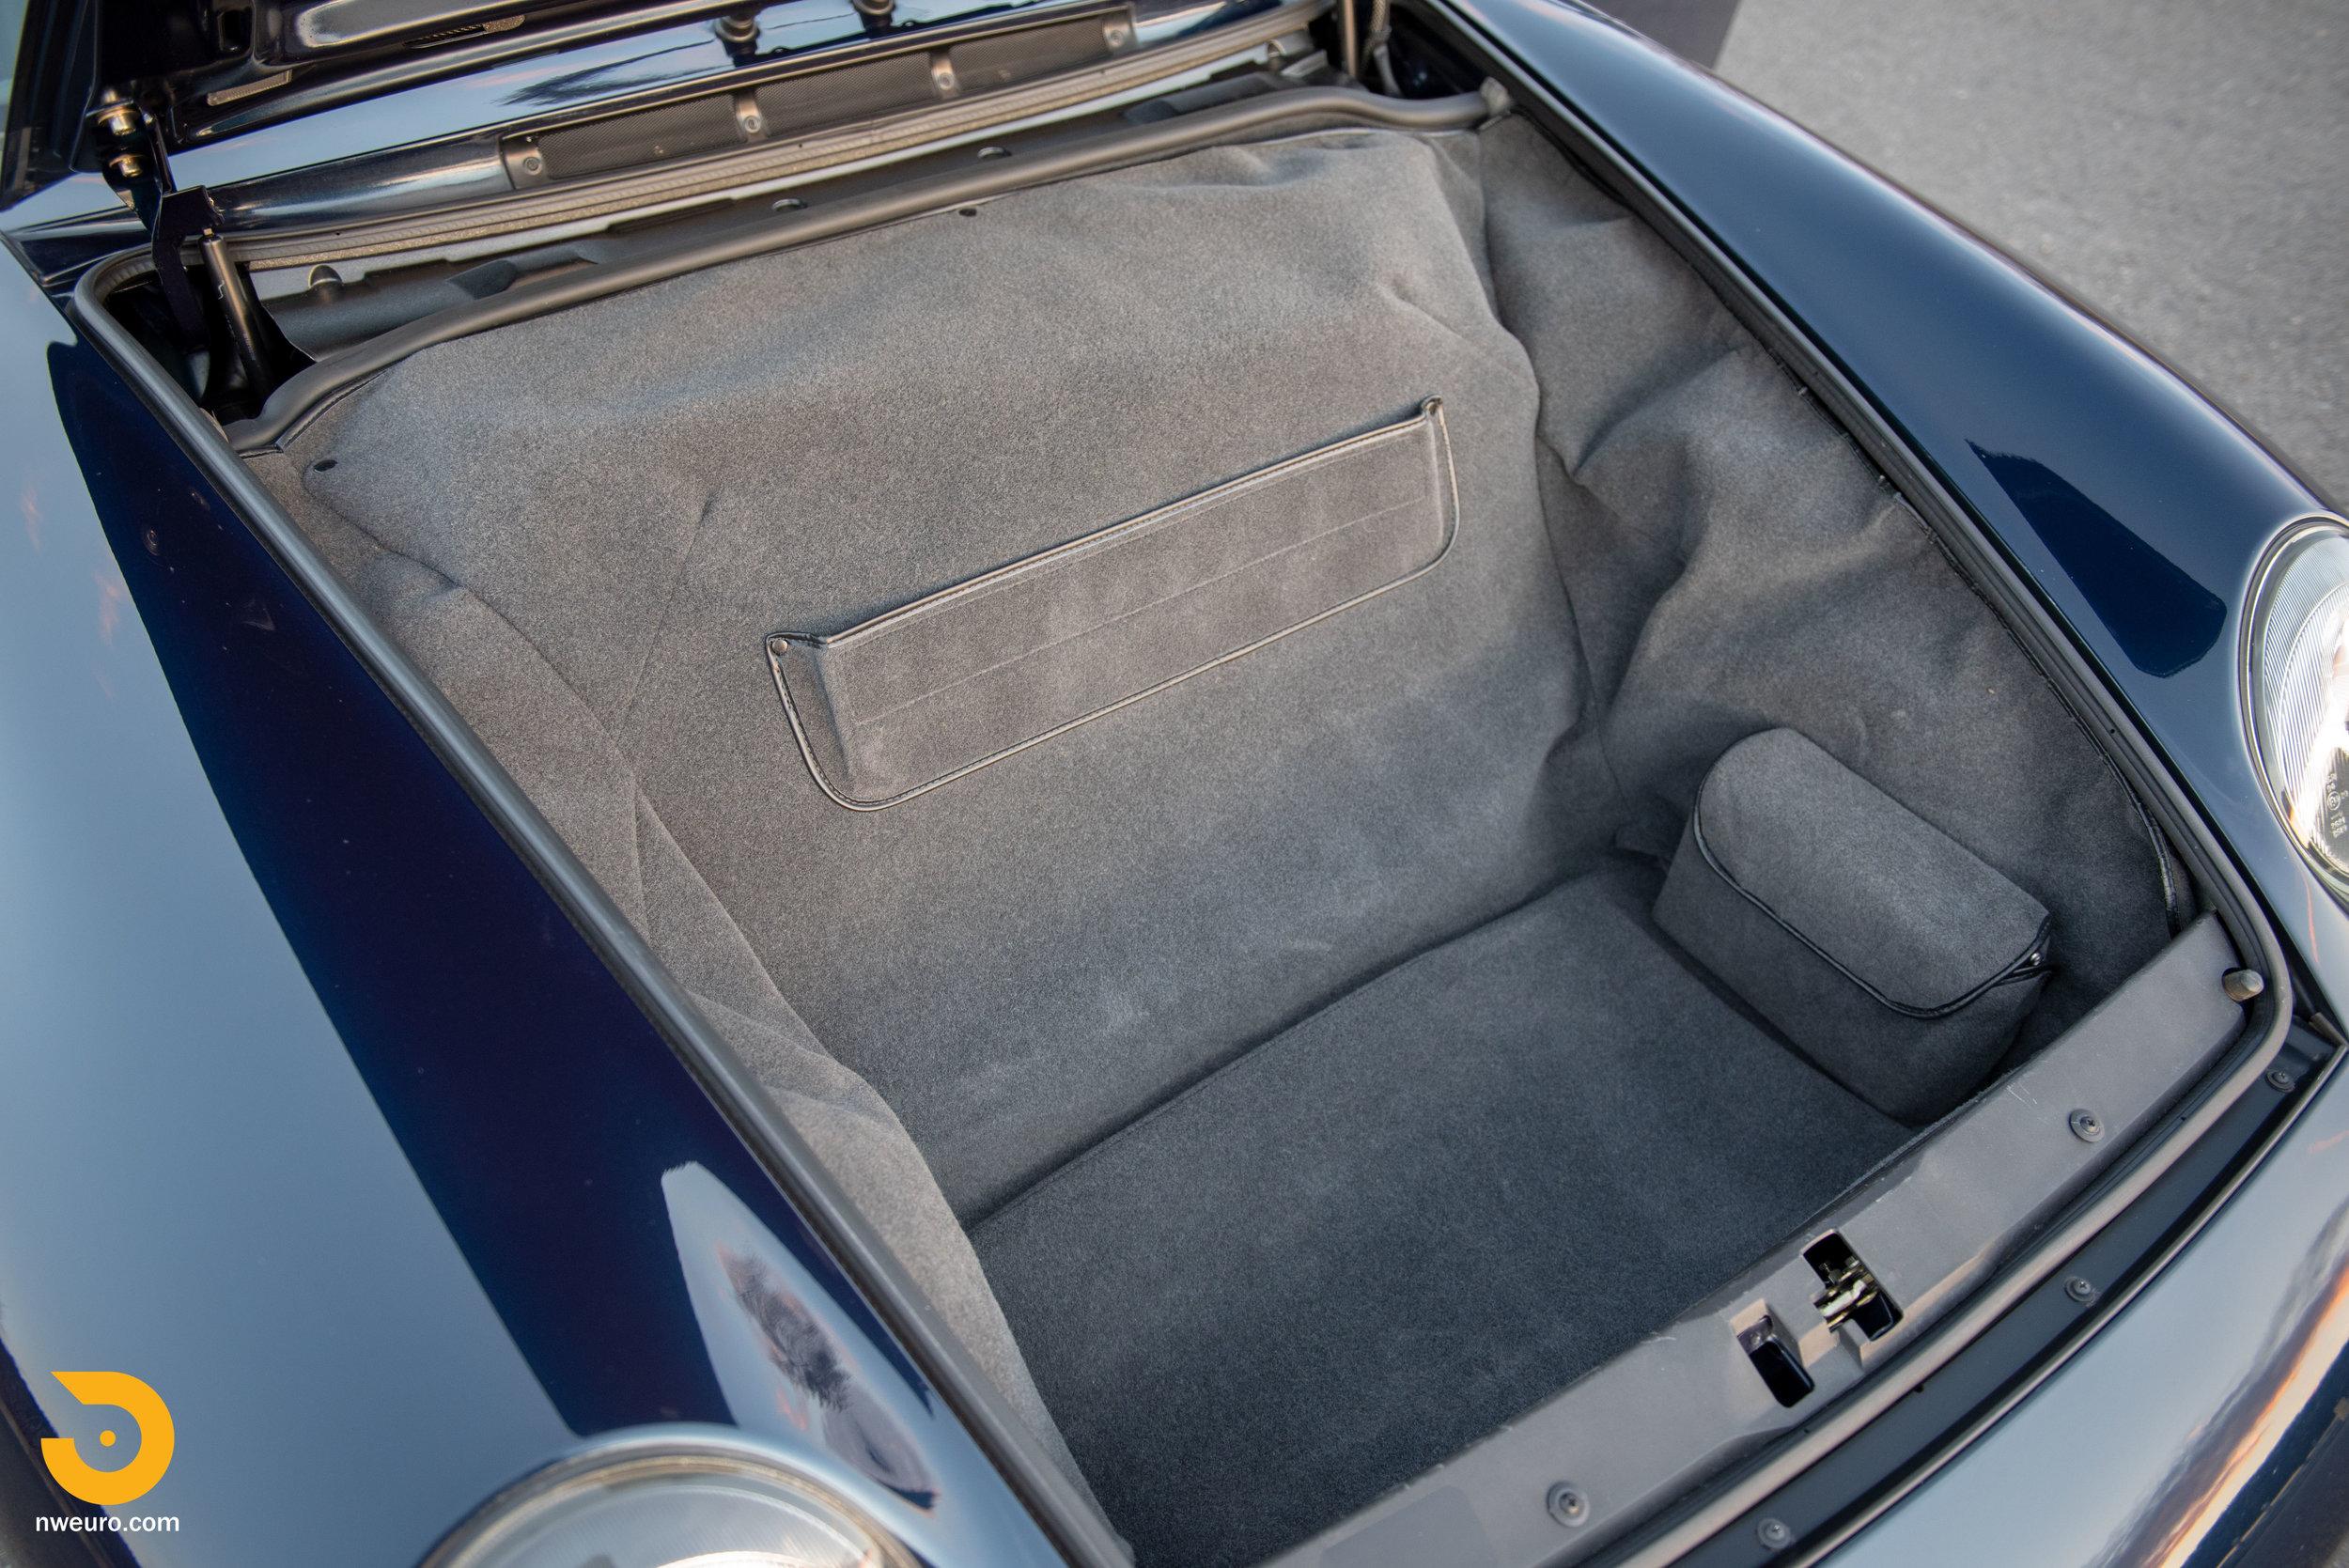 1997 Porsche 993 Turbo Ocean Blue-93.jpg